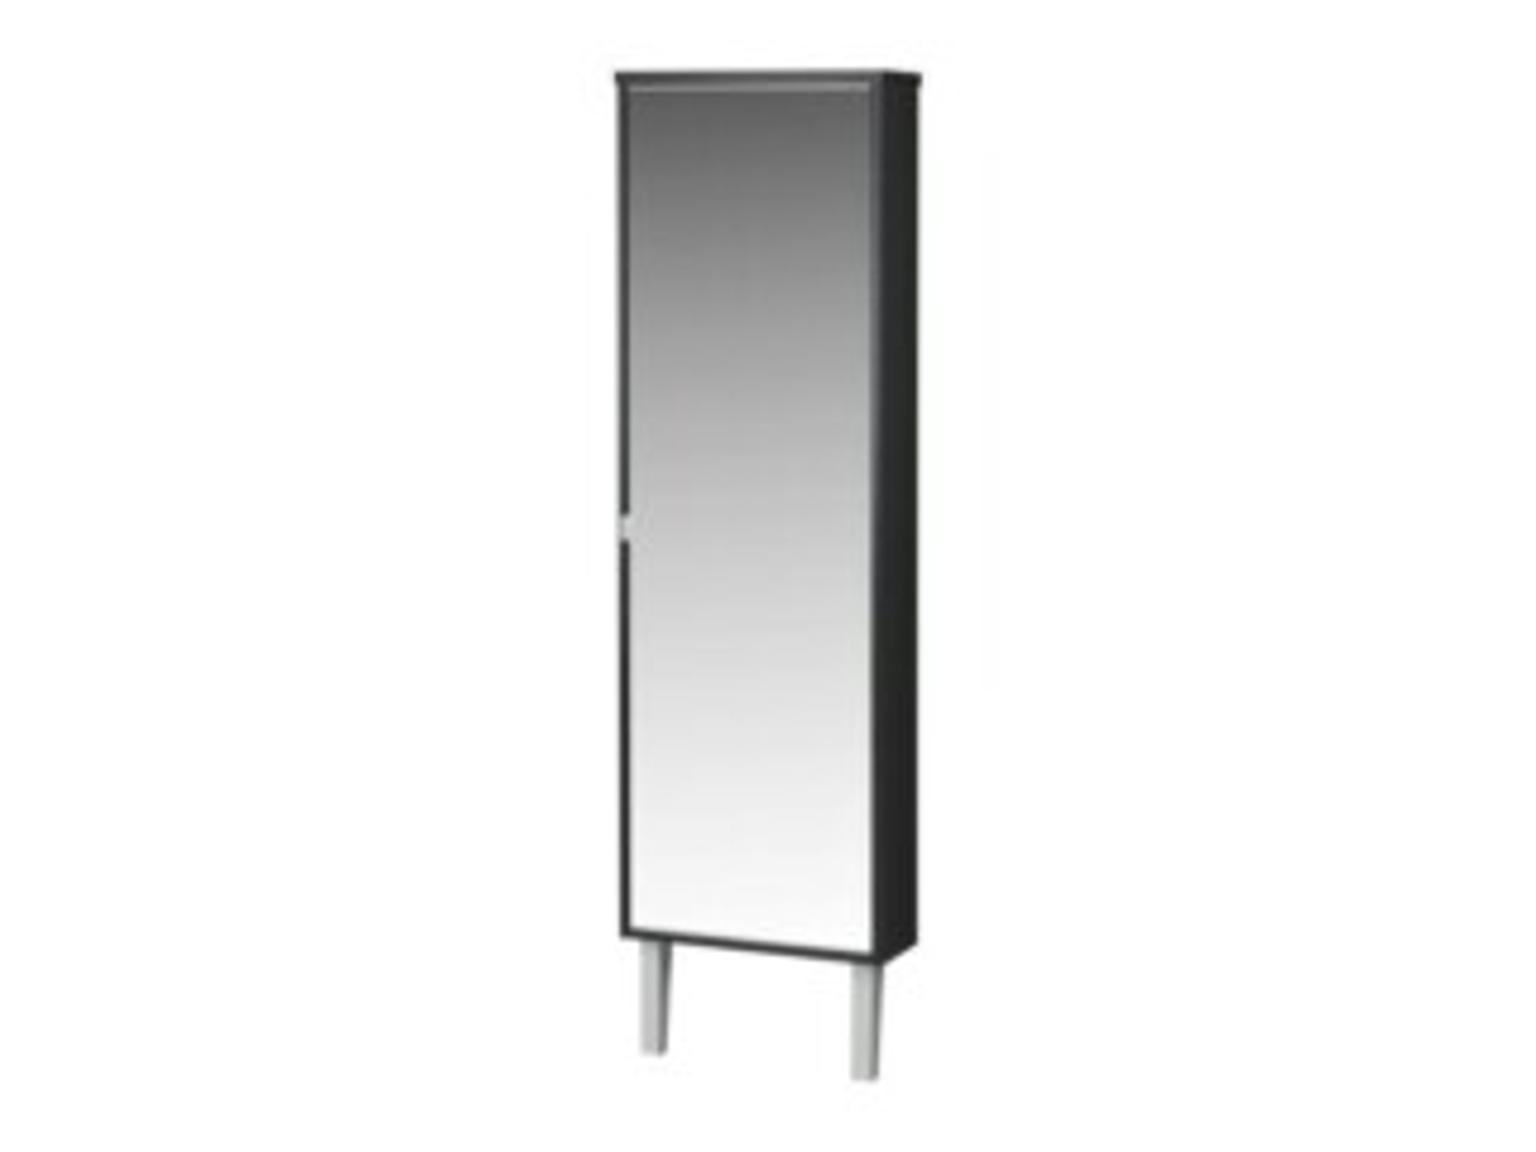 Gebraucht Ikea Skär Garderobe Garderobenschrank Top in 58093 Hagen um u20ac 60 00 u2013 Shpock